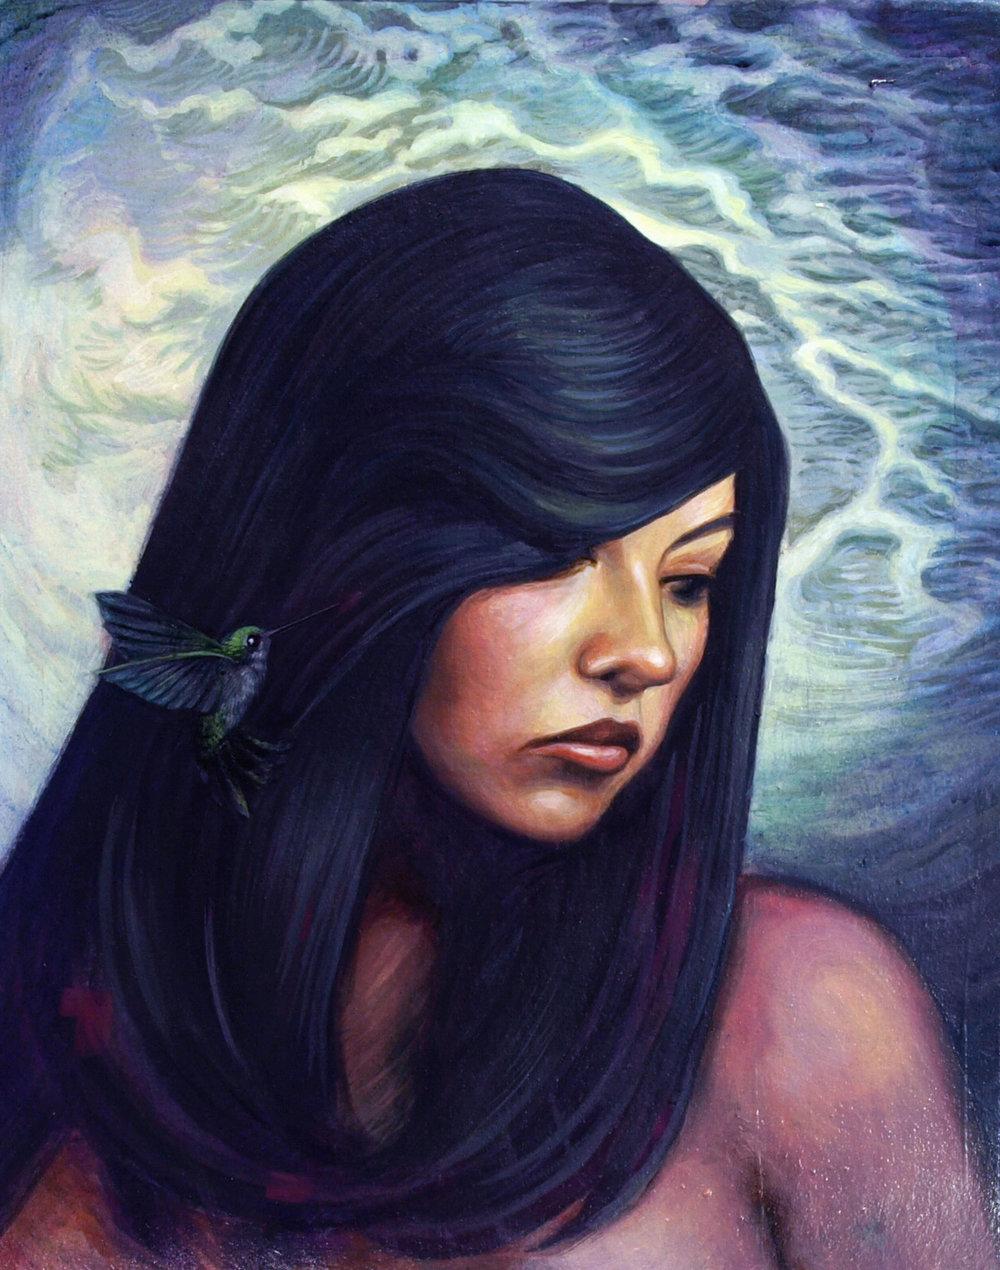 """Whispers"" by Jose Loza   http://www.jmloza.com"